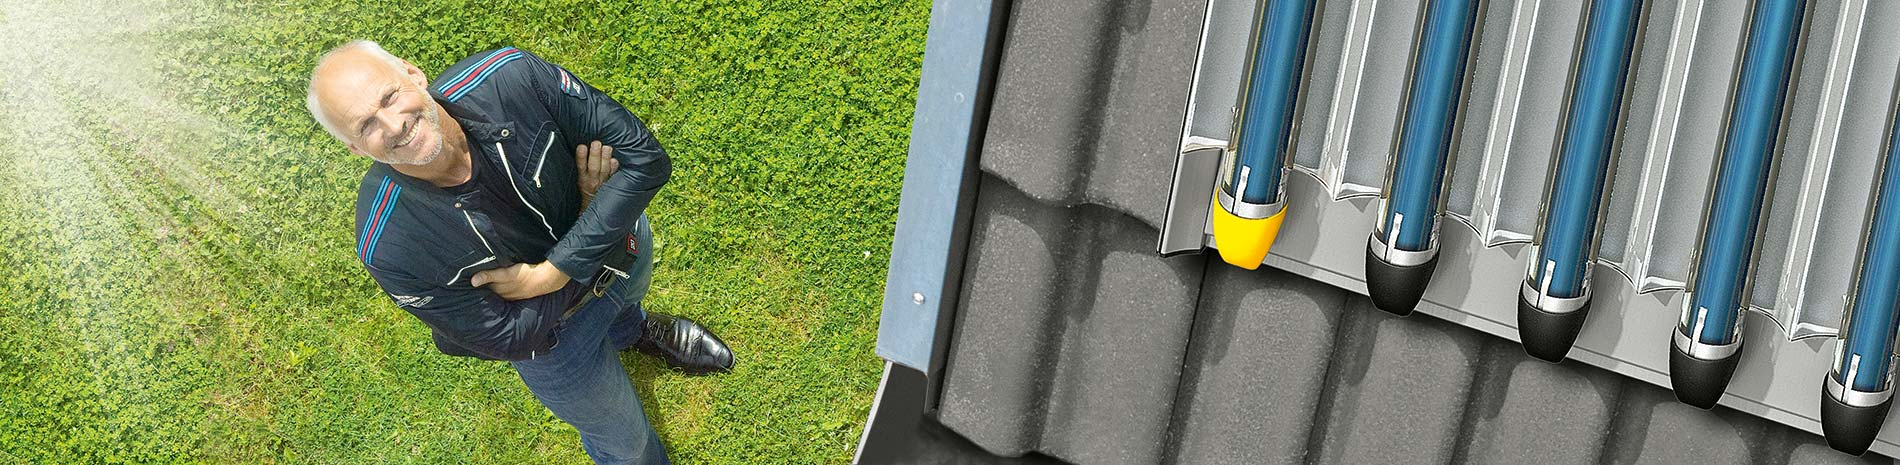 solaranlage solarheizung